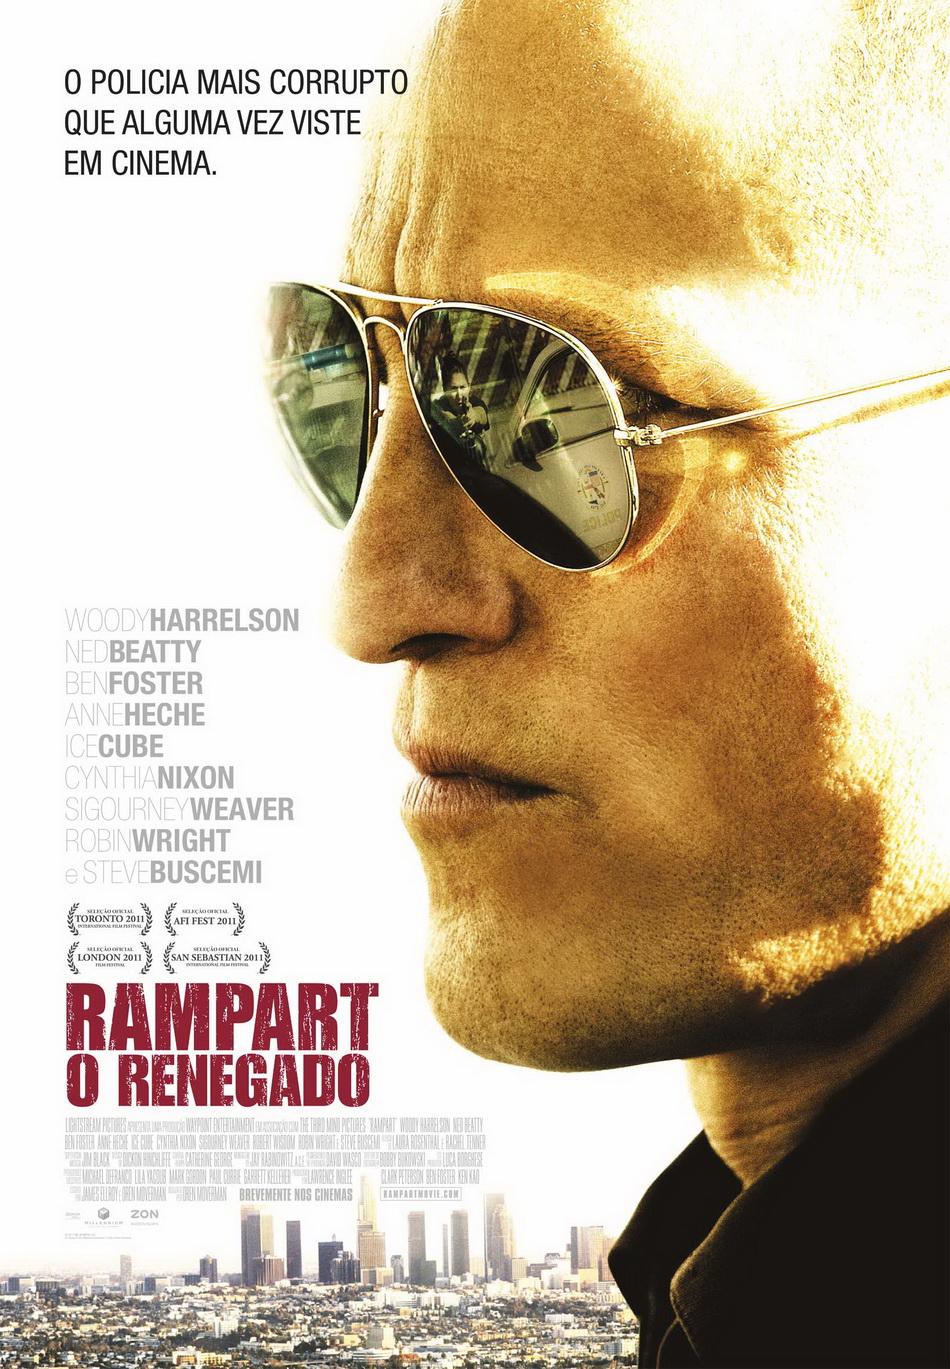 Rampart - O Renegado